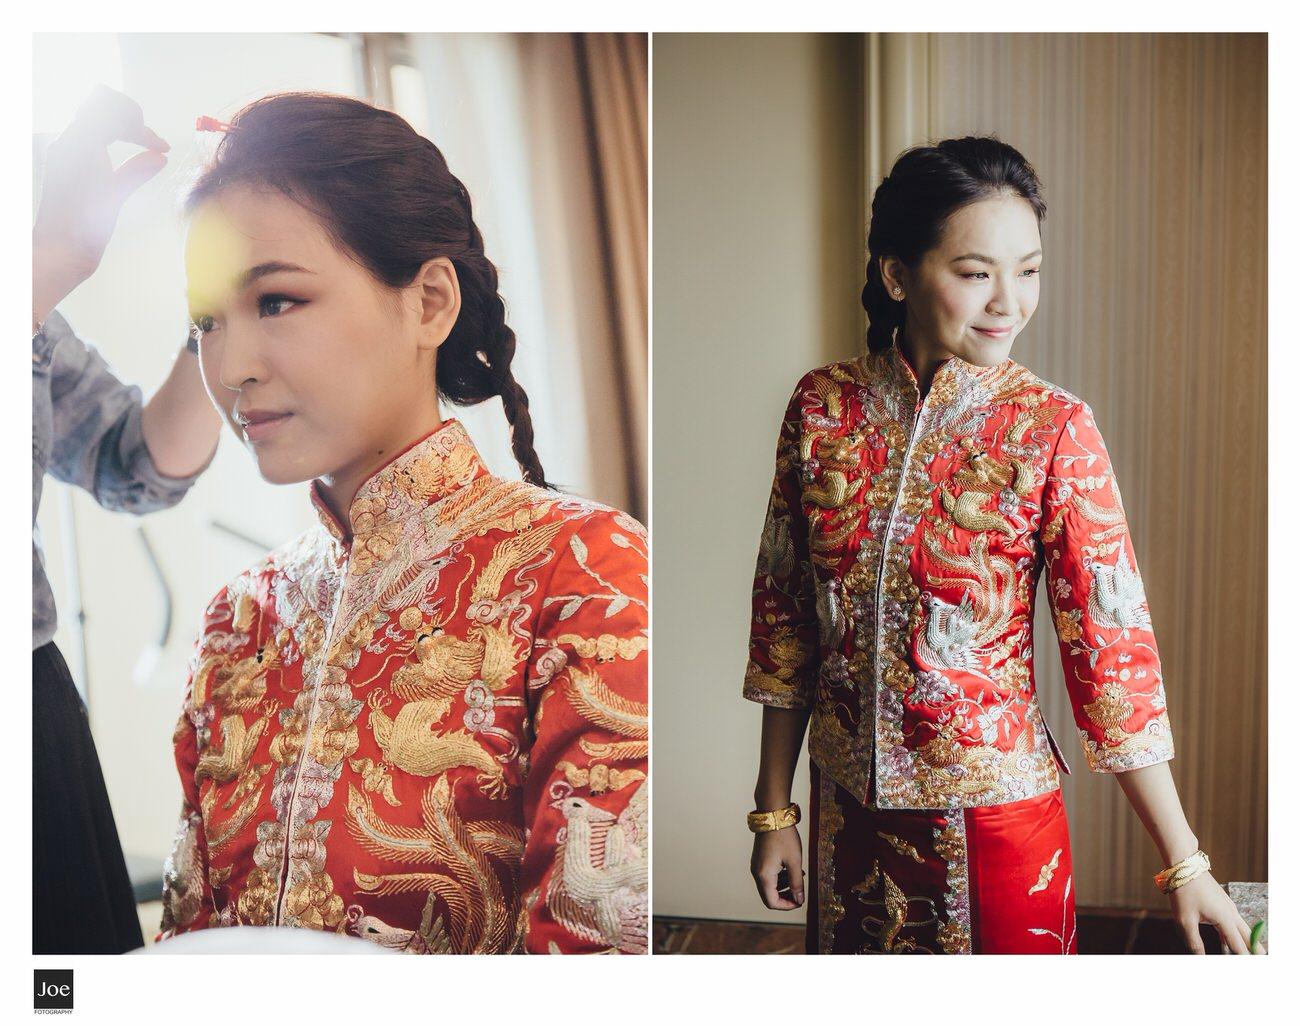 grand-hilai-hotel-wedding-daniel-yvette-joe-fotography-004.jpg